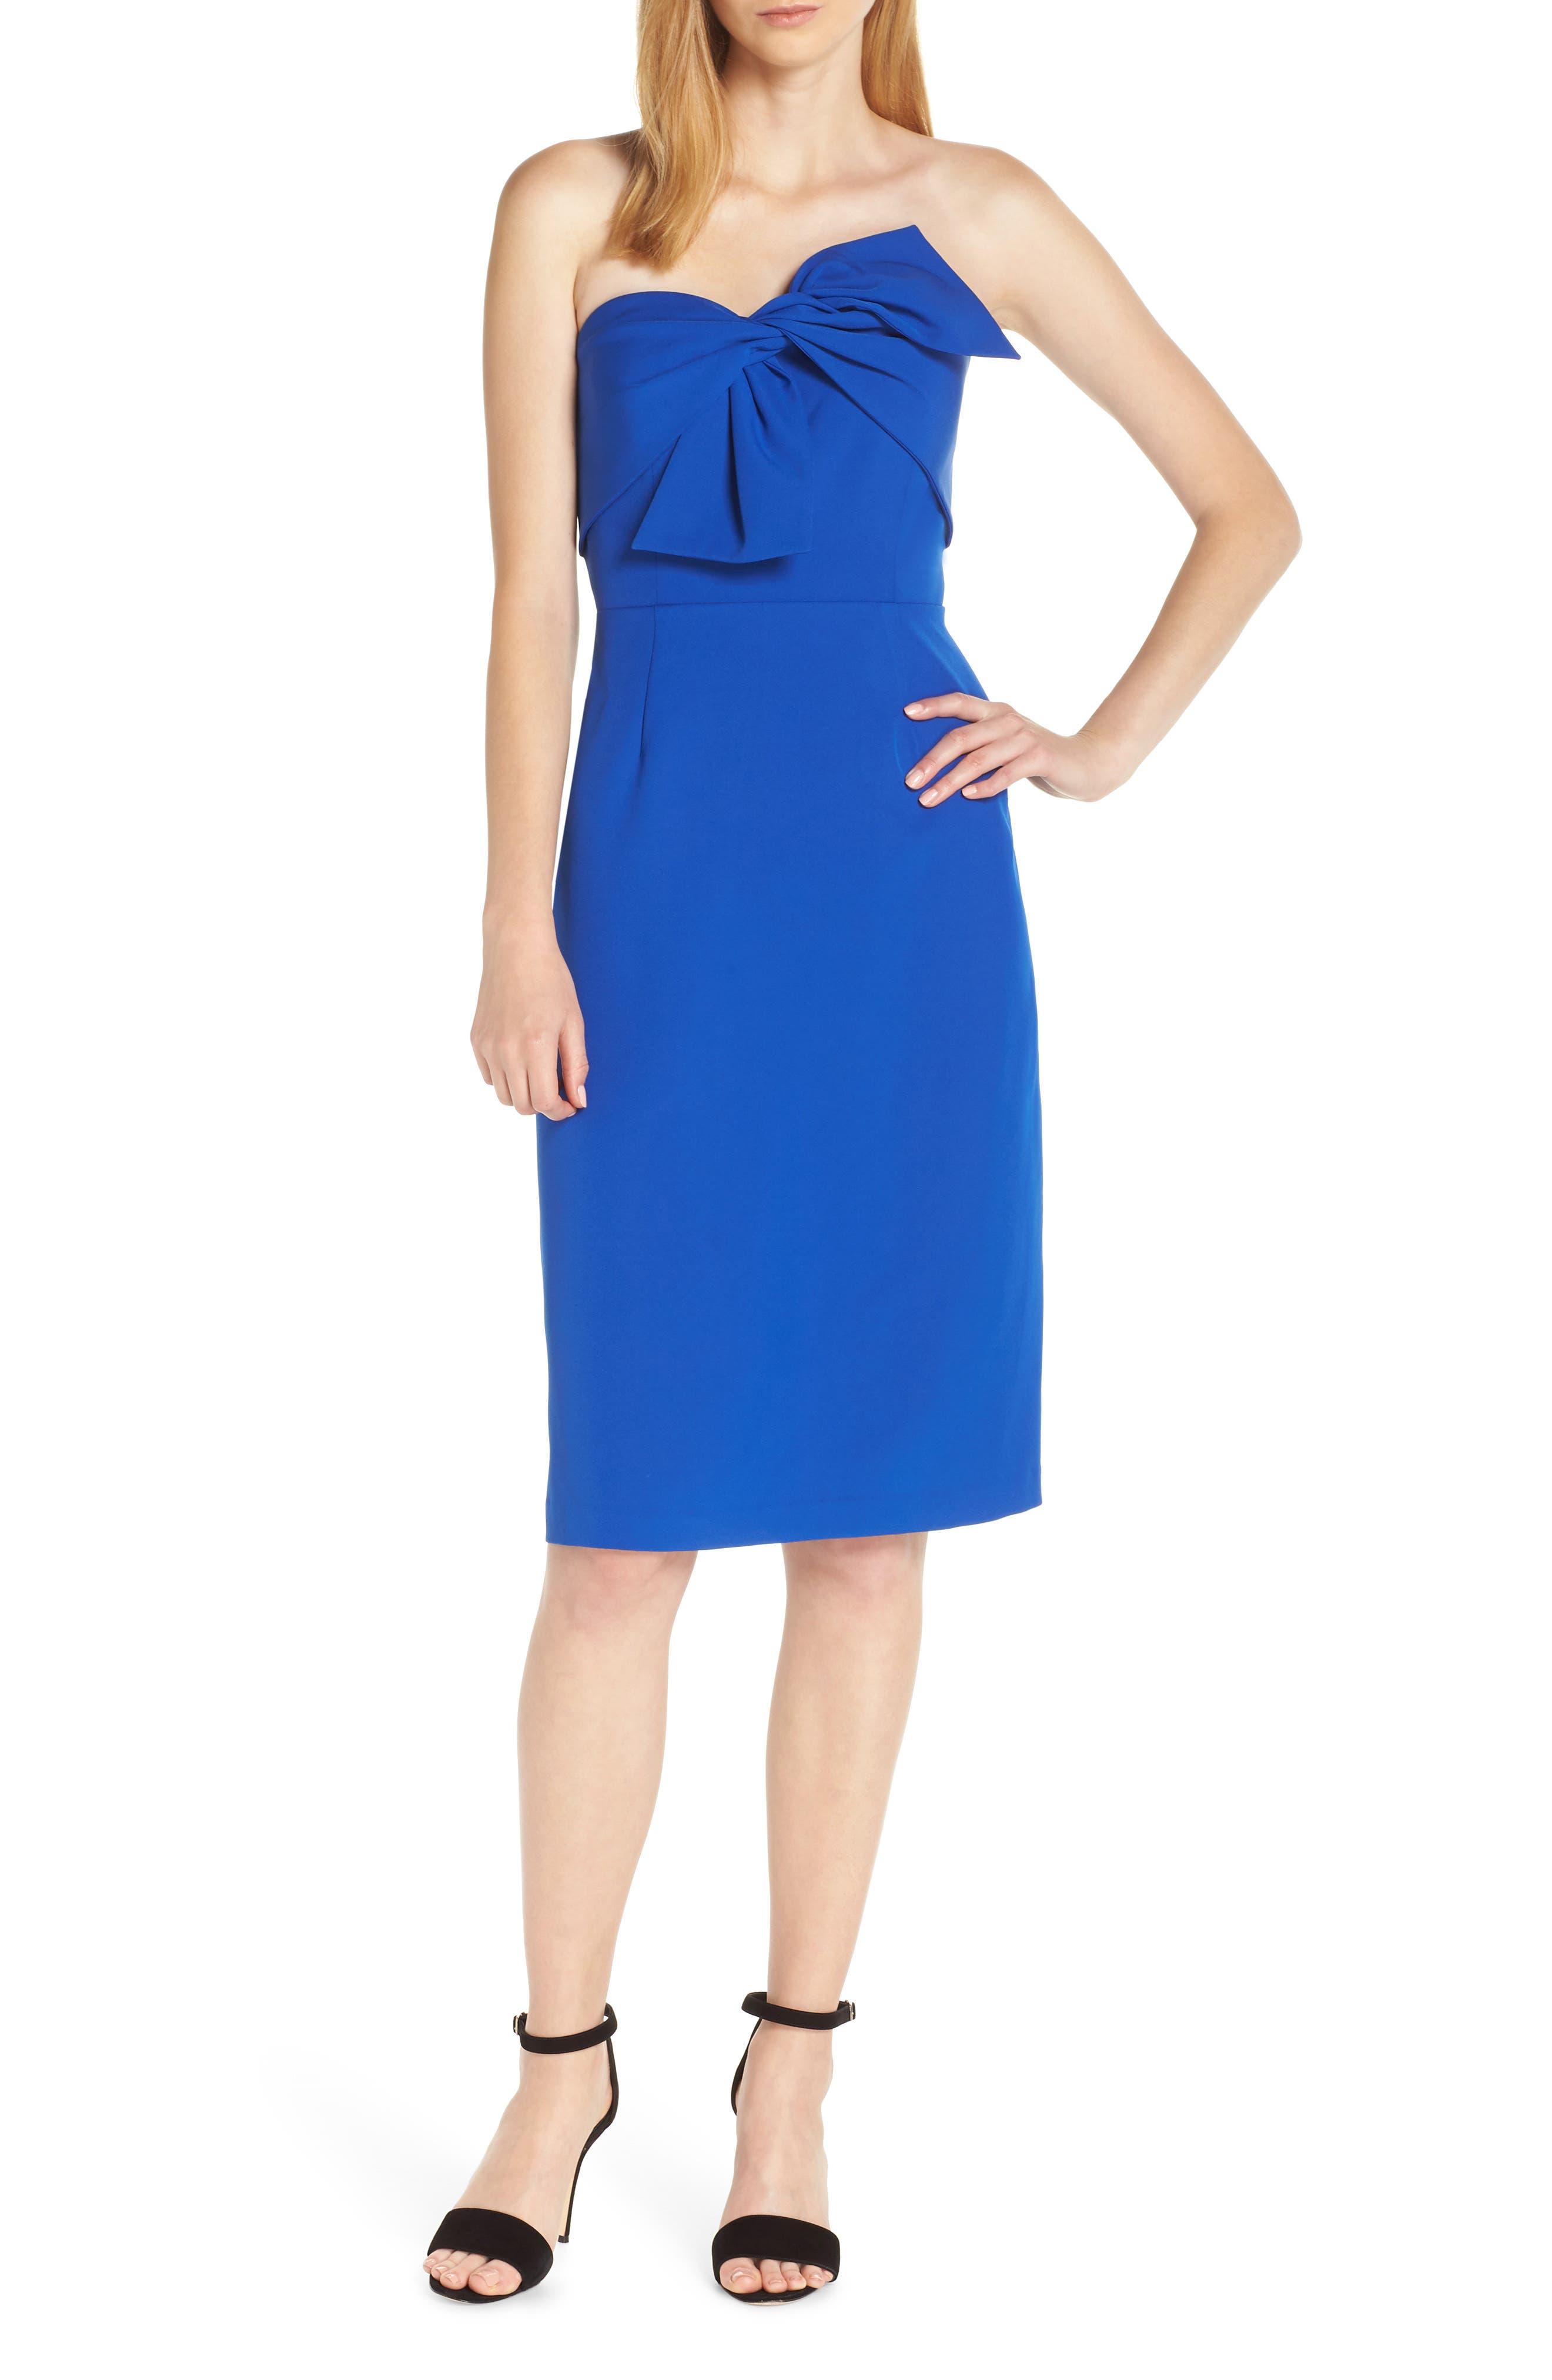 Sam Edelman Strapless Bow Detail Sheath Dress, Blue